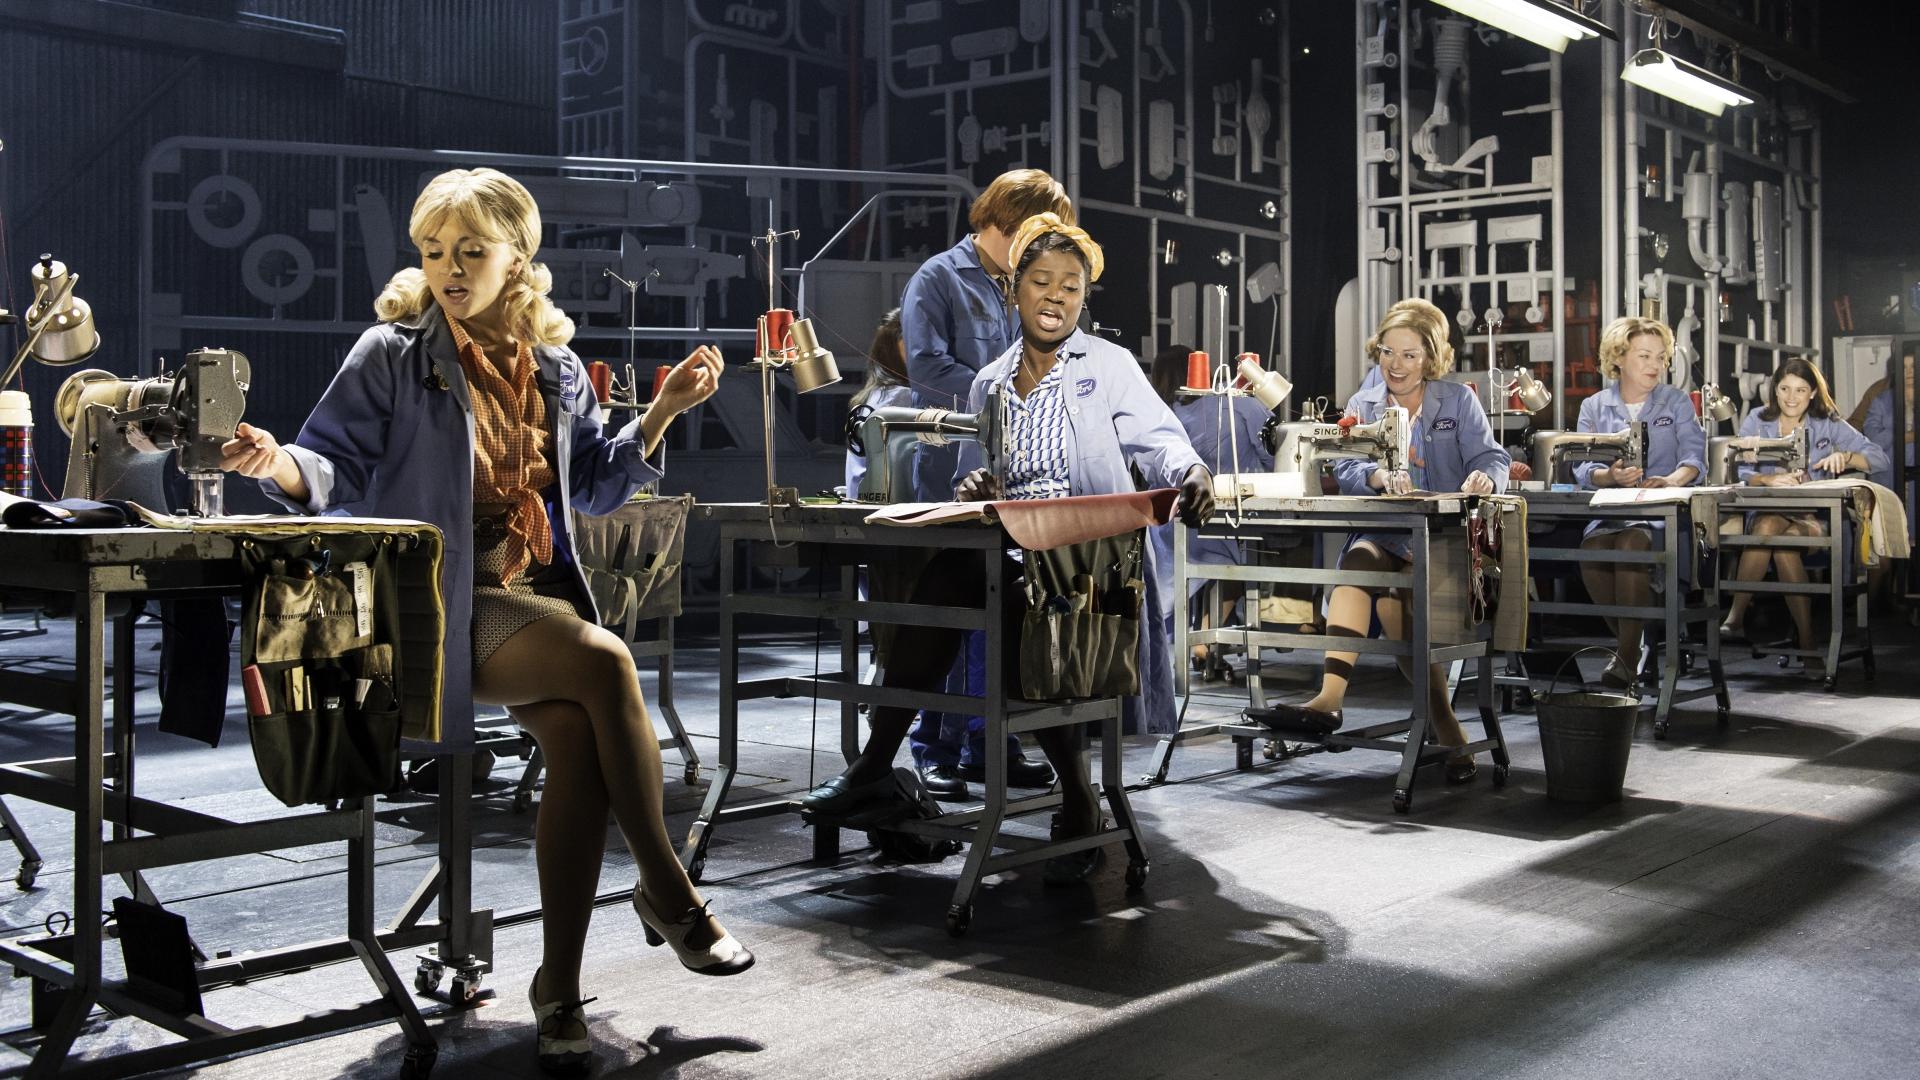 made-in-dagenham-review-musical-gemma-arterton-london